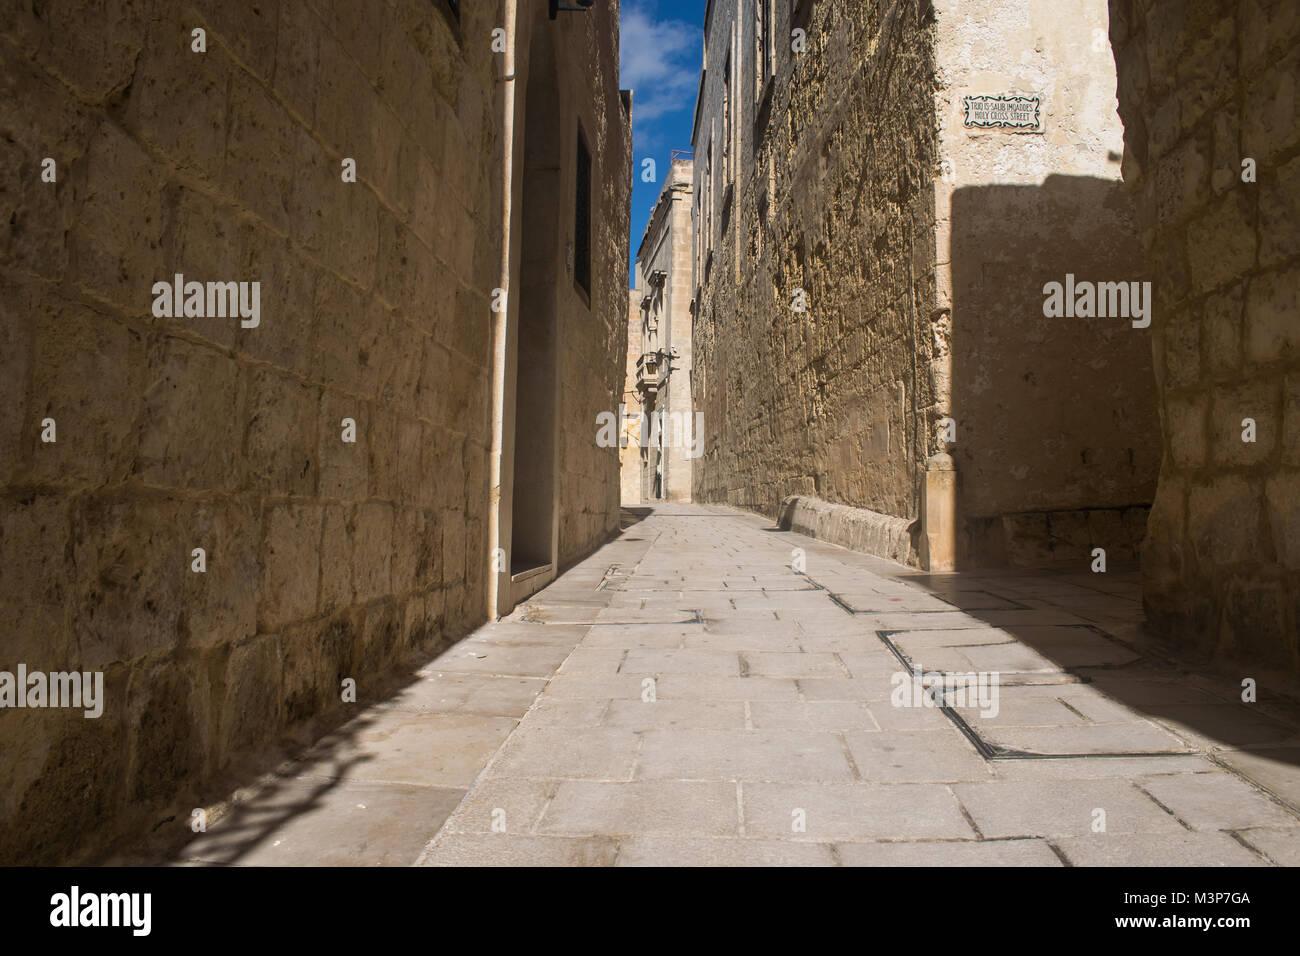 Enjoying a walkin a quite historical road in Mdina, Malta. - Stock Image